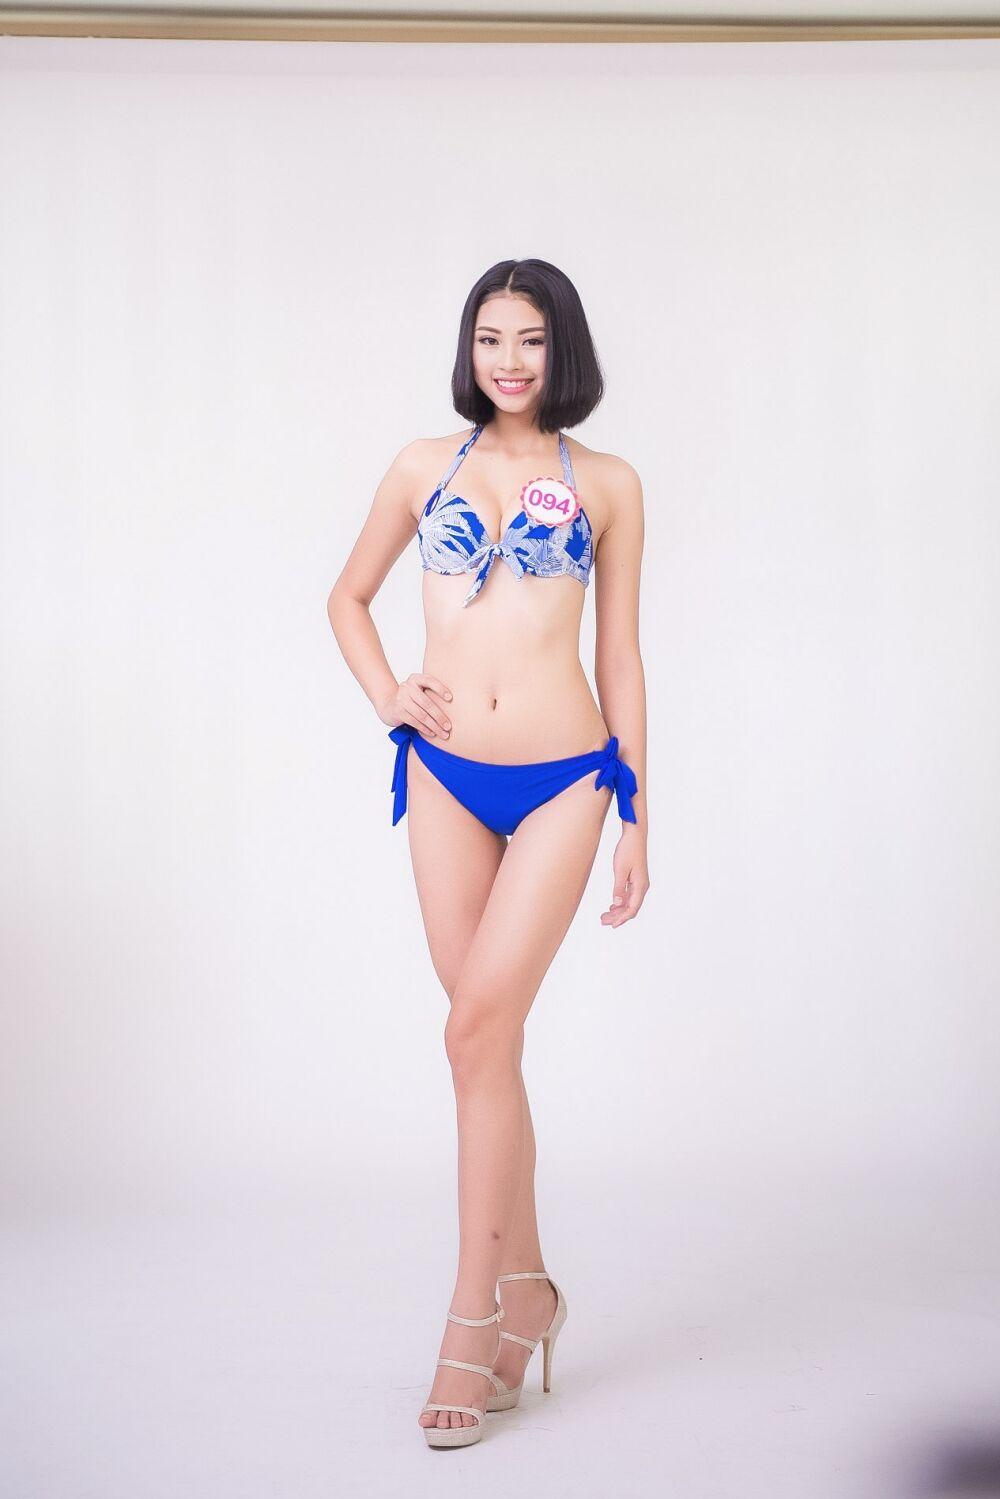 foto-modeley-vetnamok-v-bikini-razvratnie-korporativi-zhenskie-video